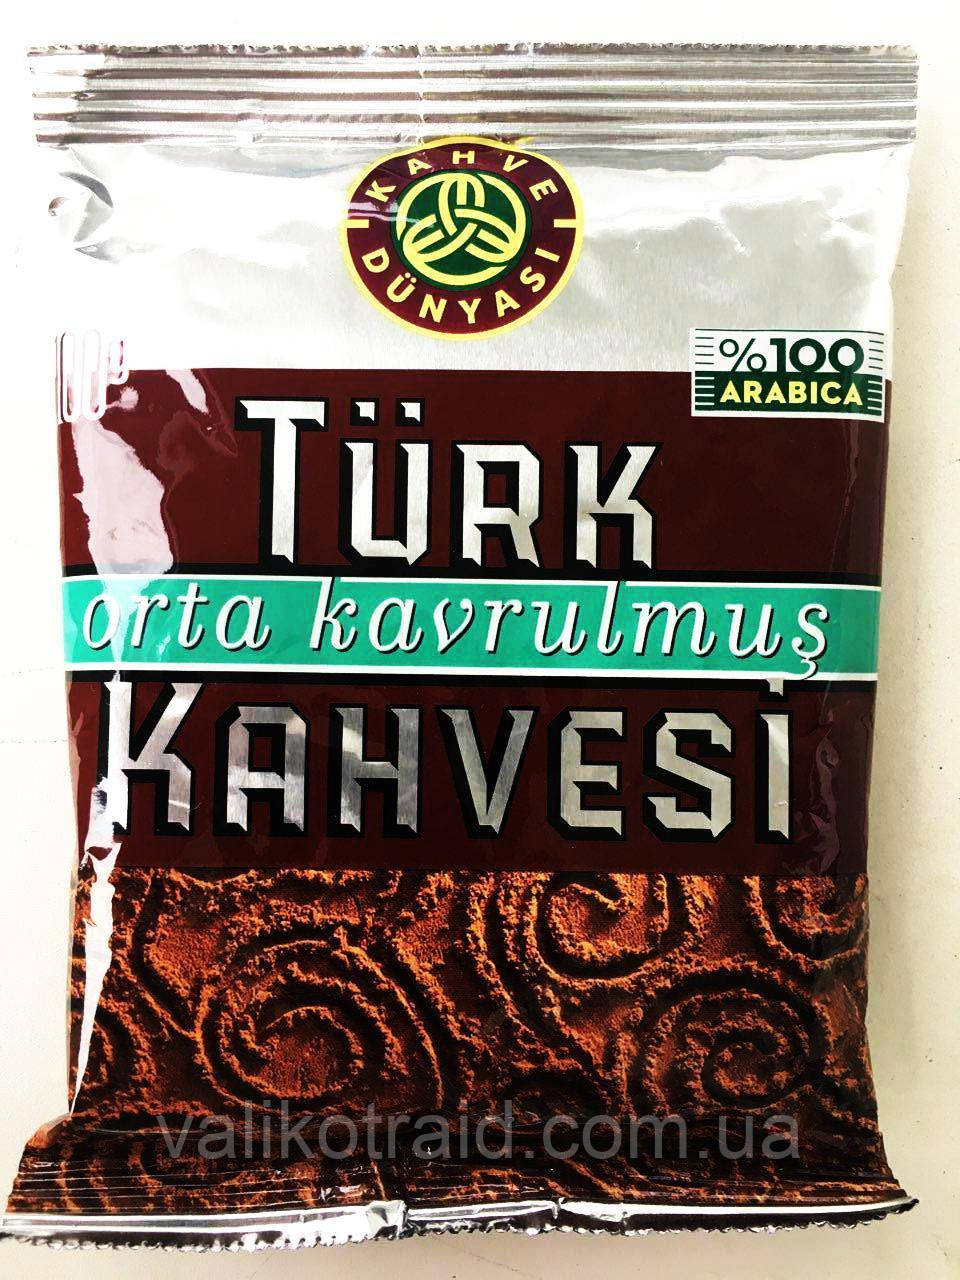 "Кава турецький ""Dunyasi Кeyfe turk kahvesi"", 100г Туреччина"